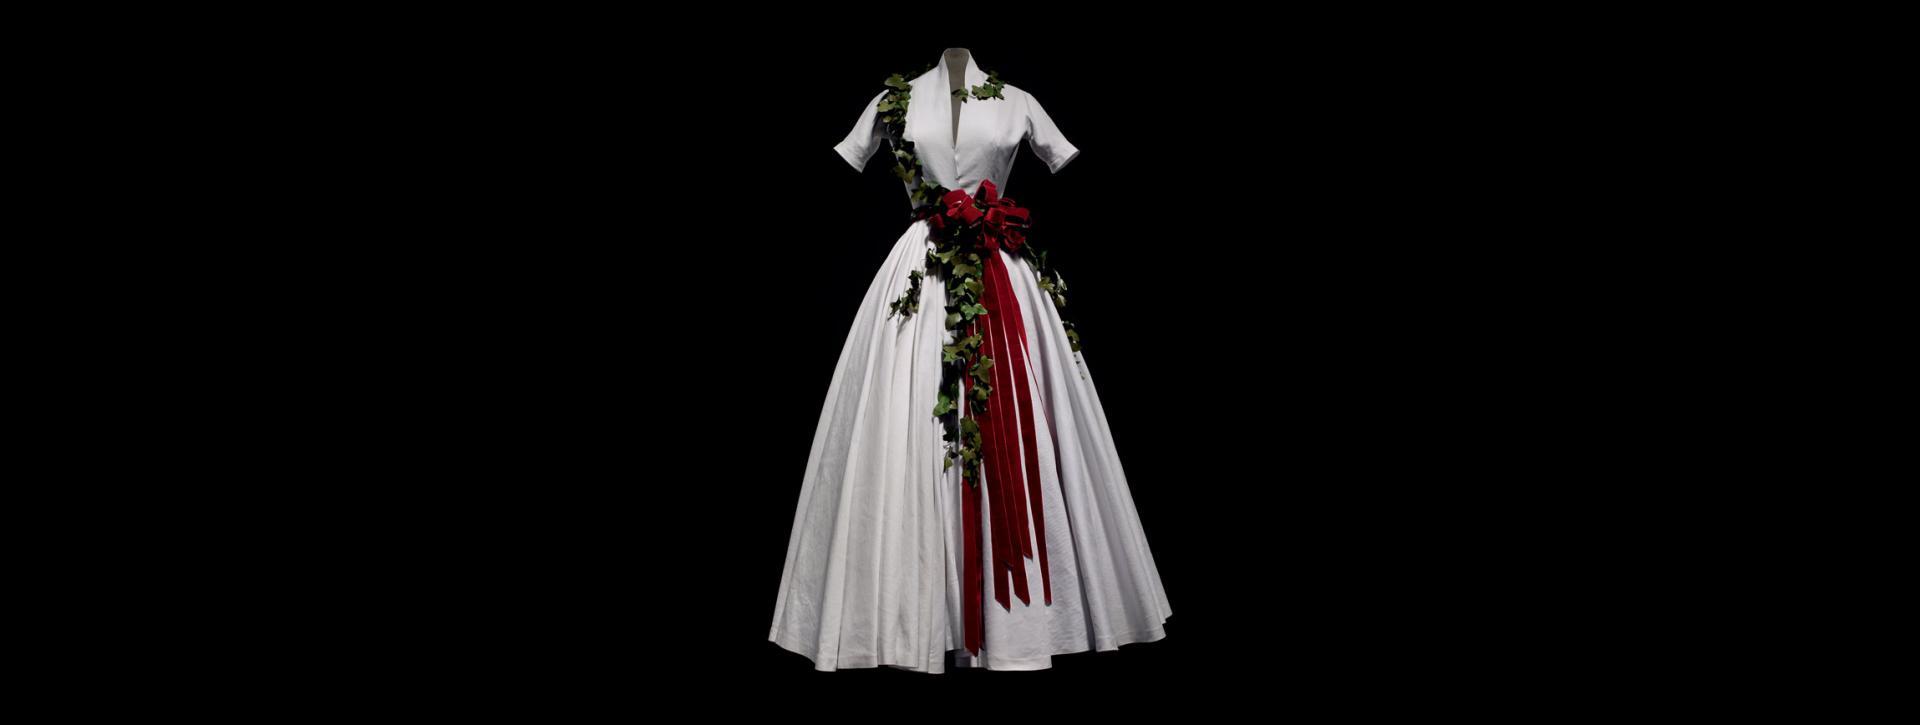 robe-blanche-1_full-visio